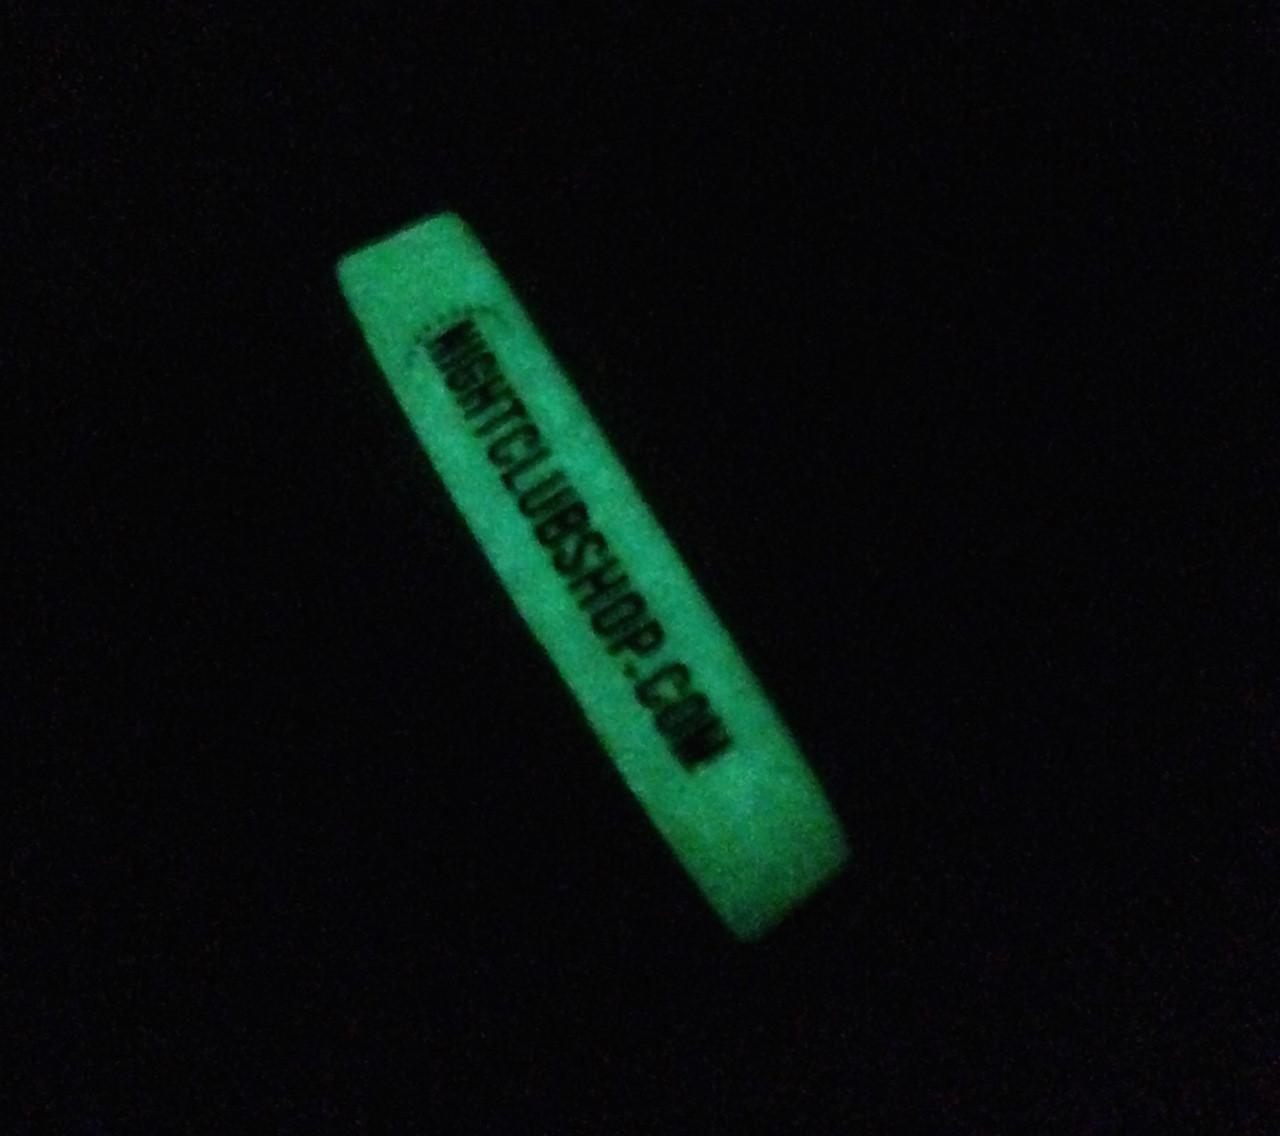 custom, printed, personalized,Glow, Glowing, Wristband, Bracelet,Dj, promo, promotional, Branding